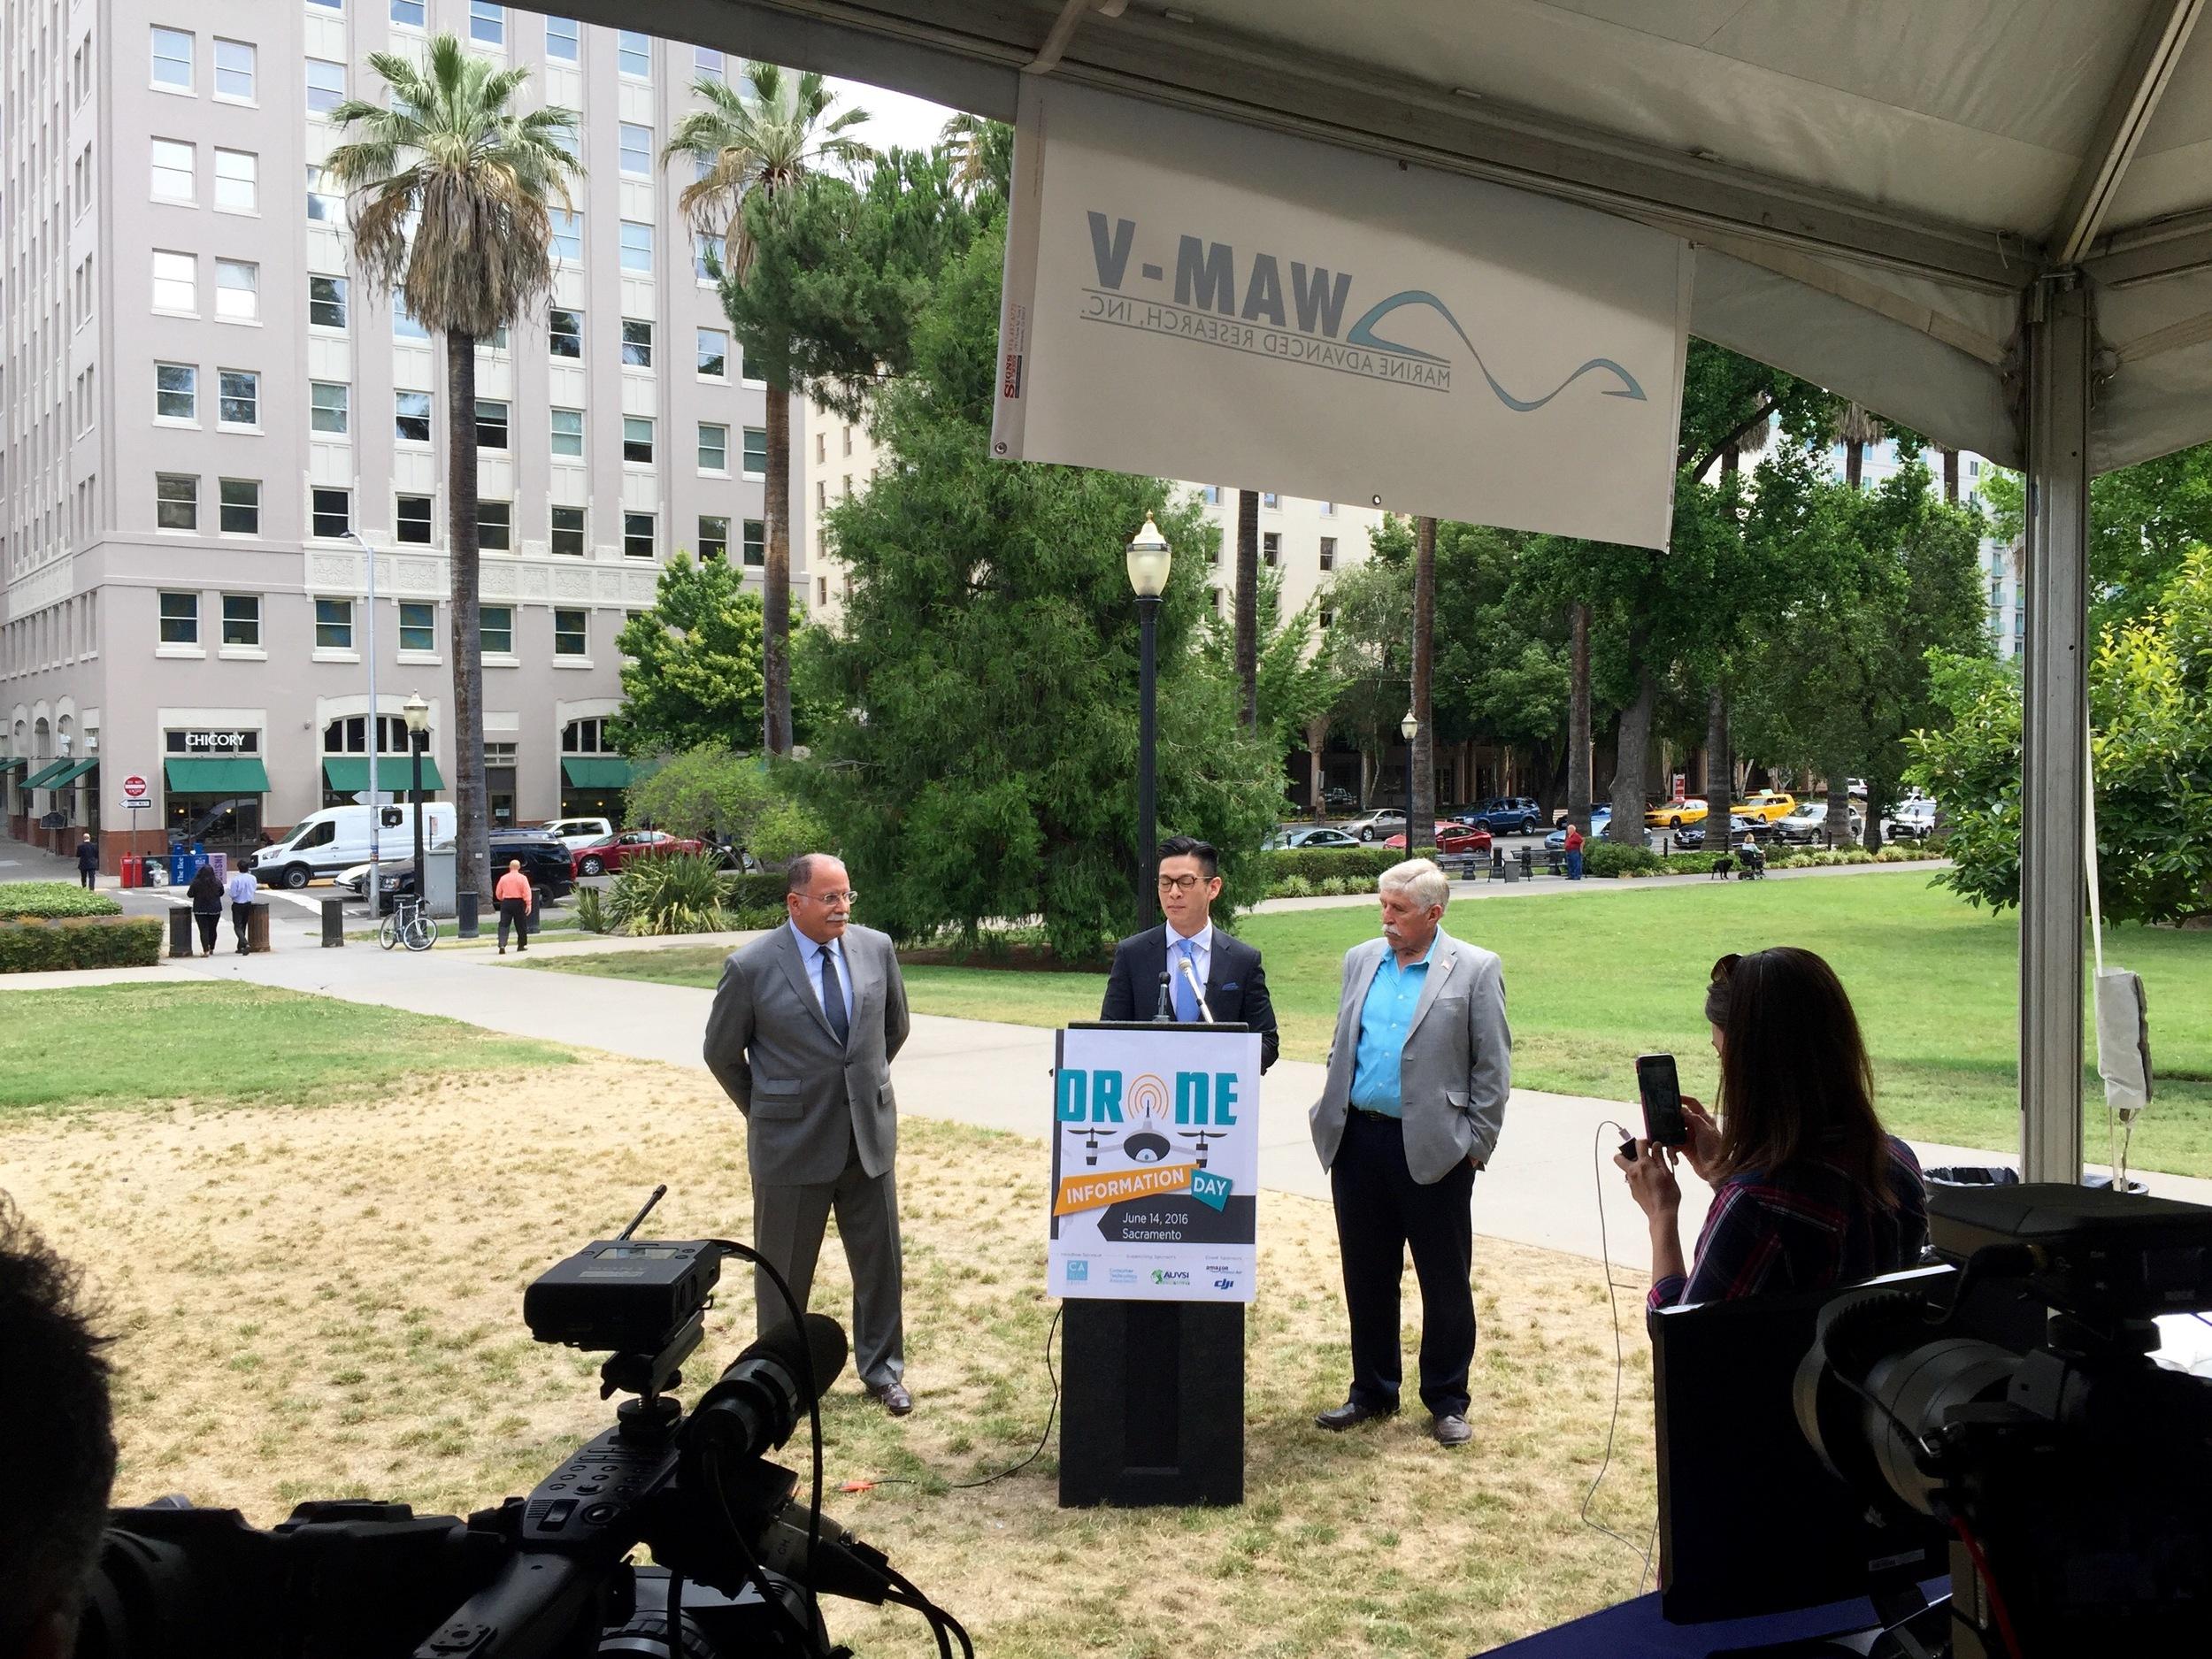 Assemblyman Evan Low addresses Drone Information Day